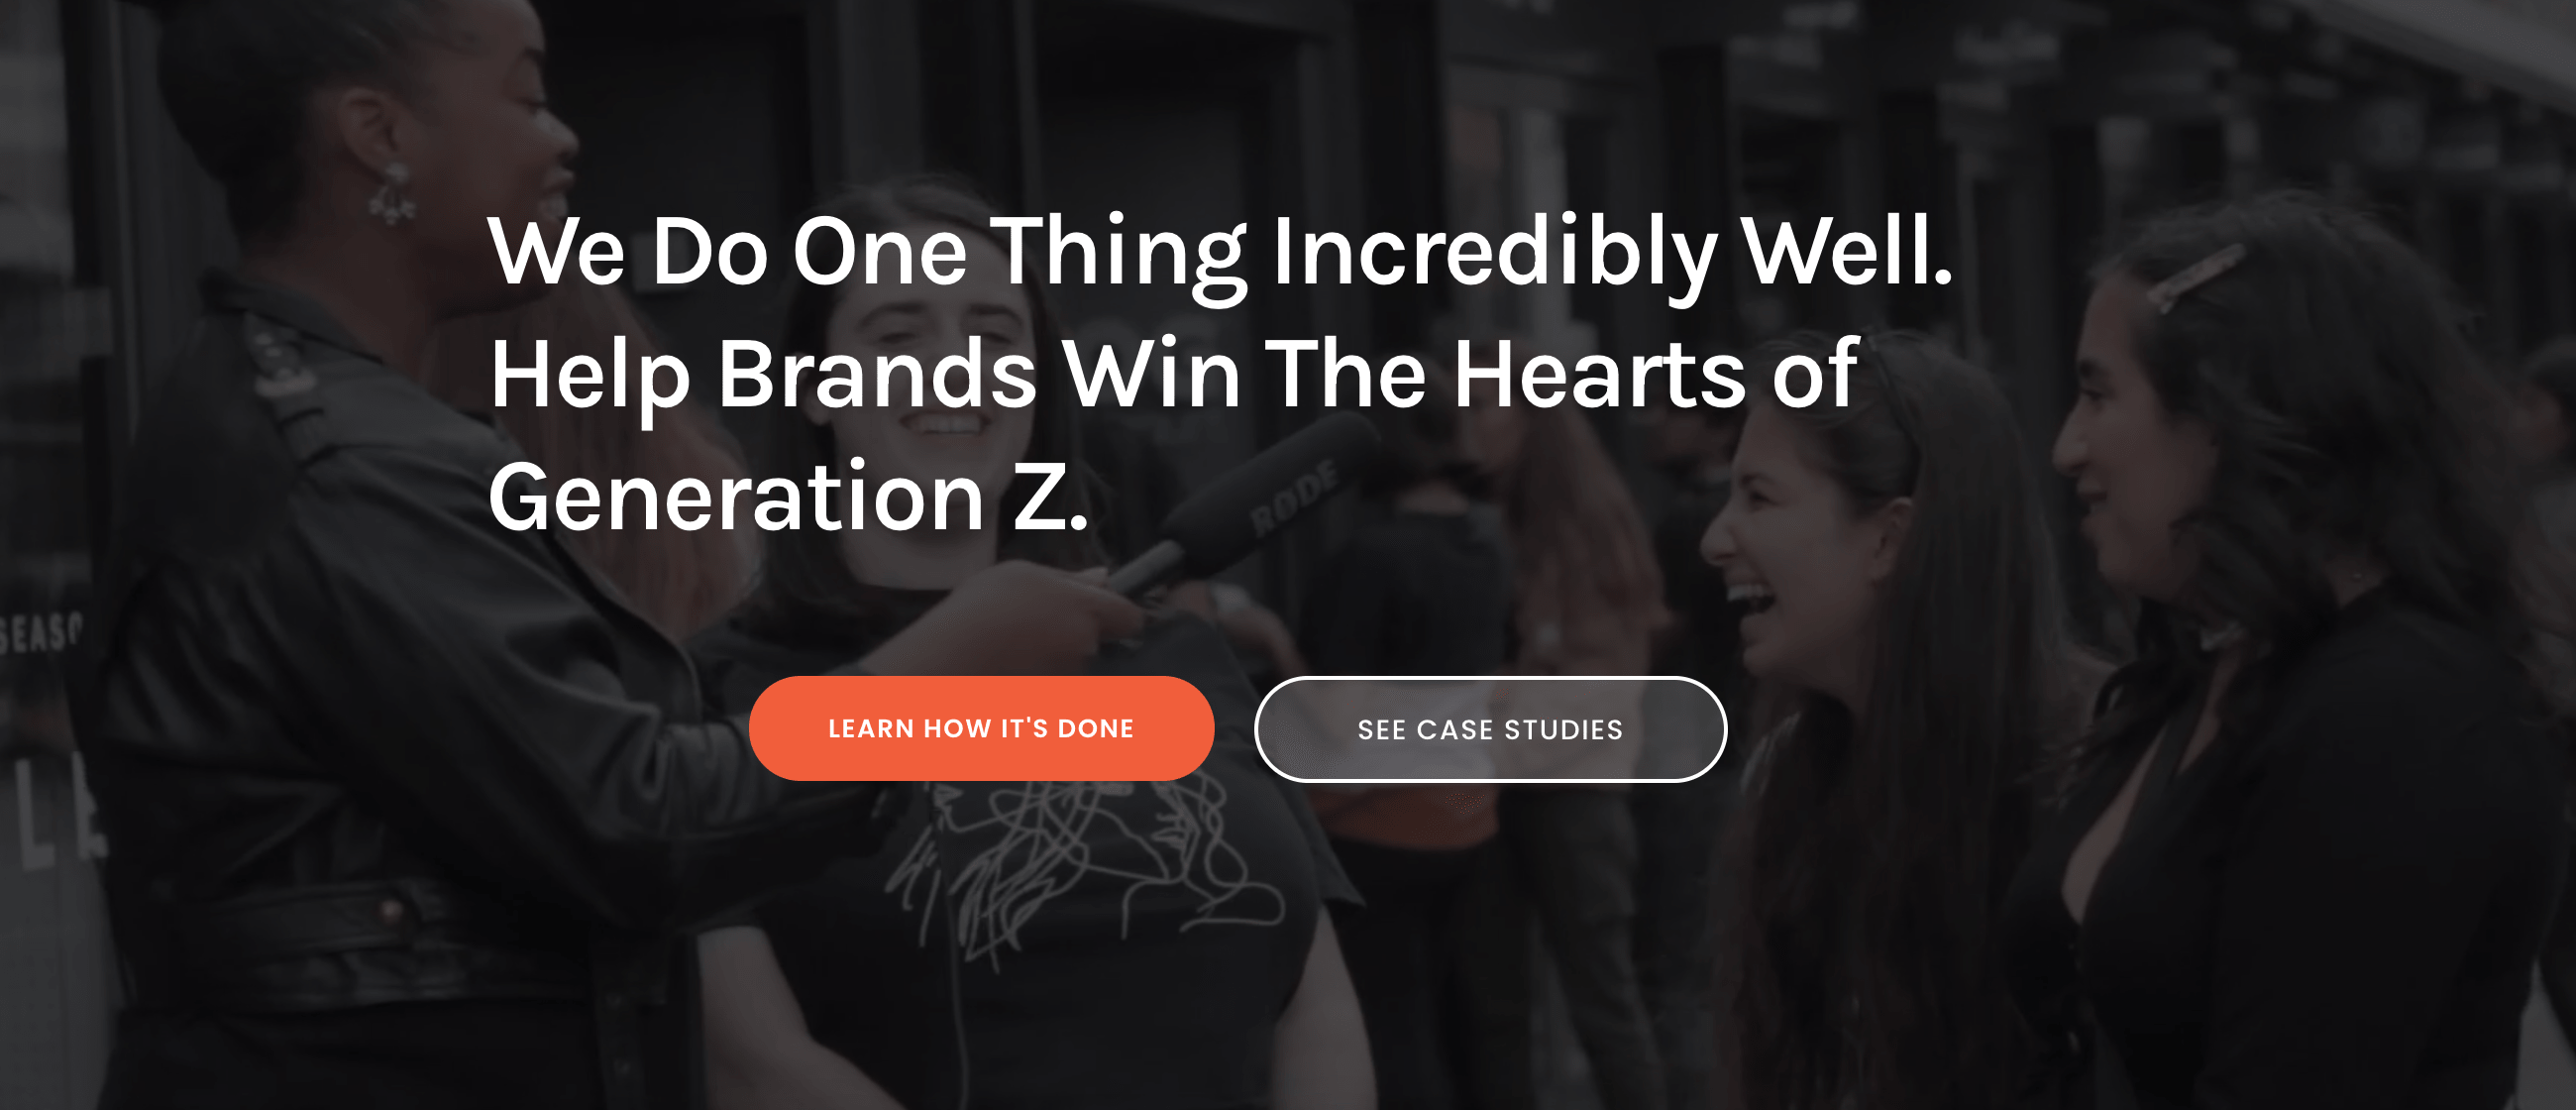 Fanbytes-Agency-influencer-marketing